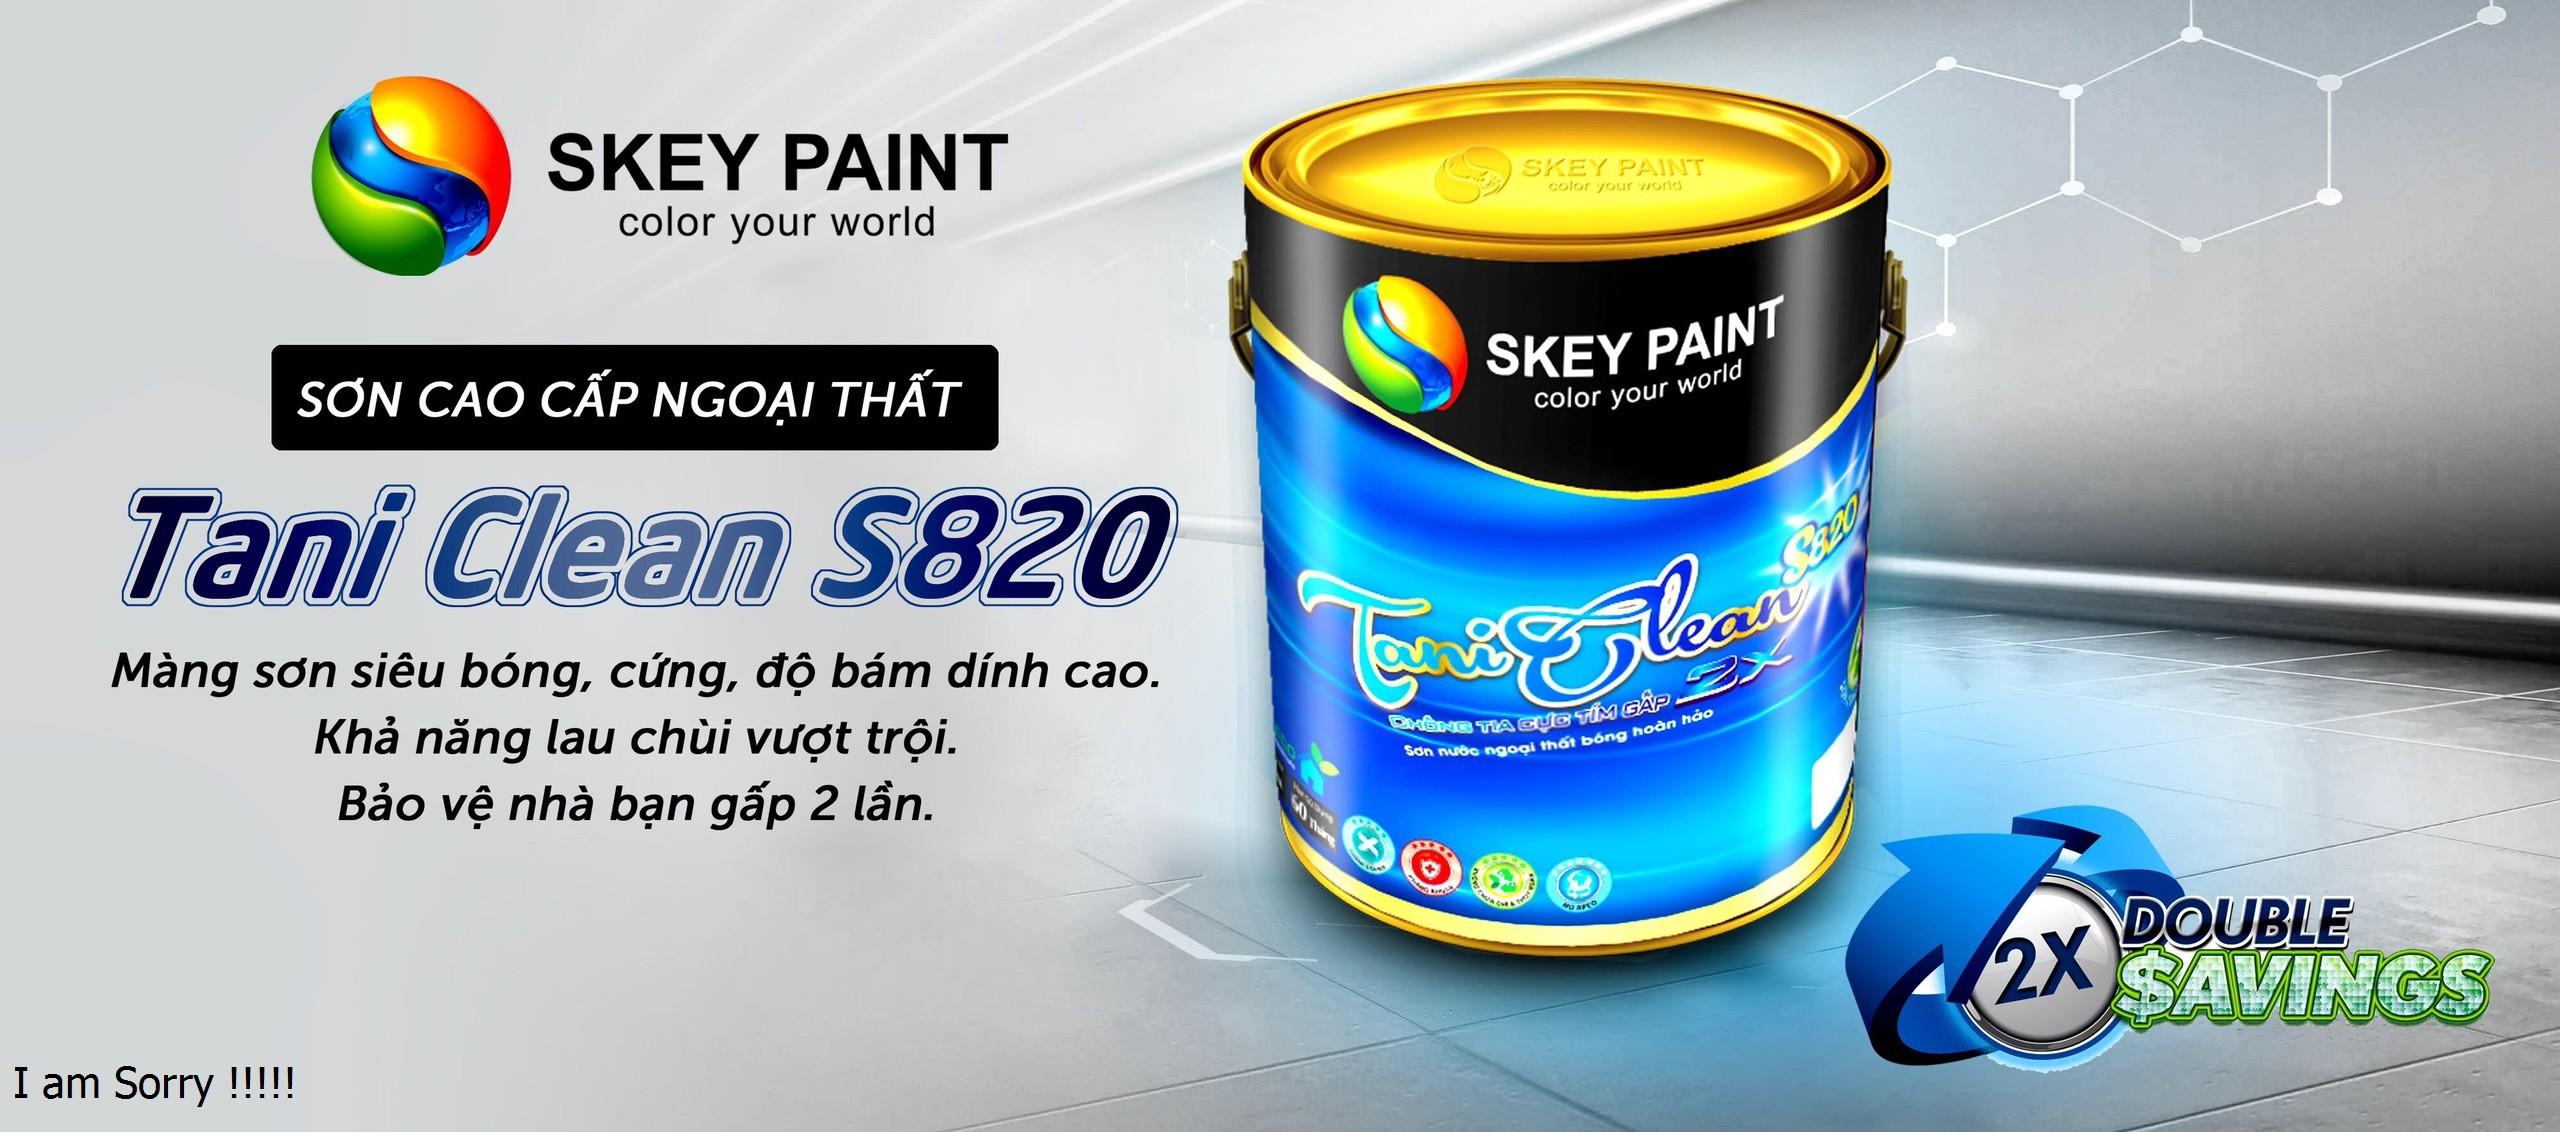 SƠN CAO CẤP NGOẠI THẤT TANI CLEAN S820